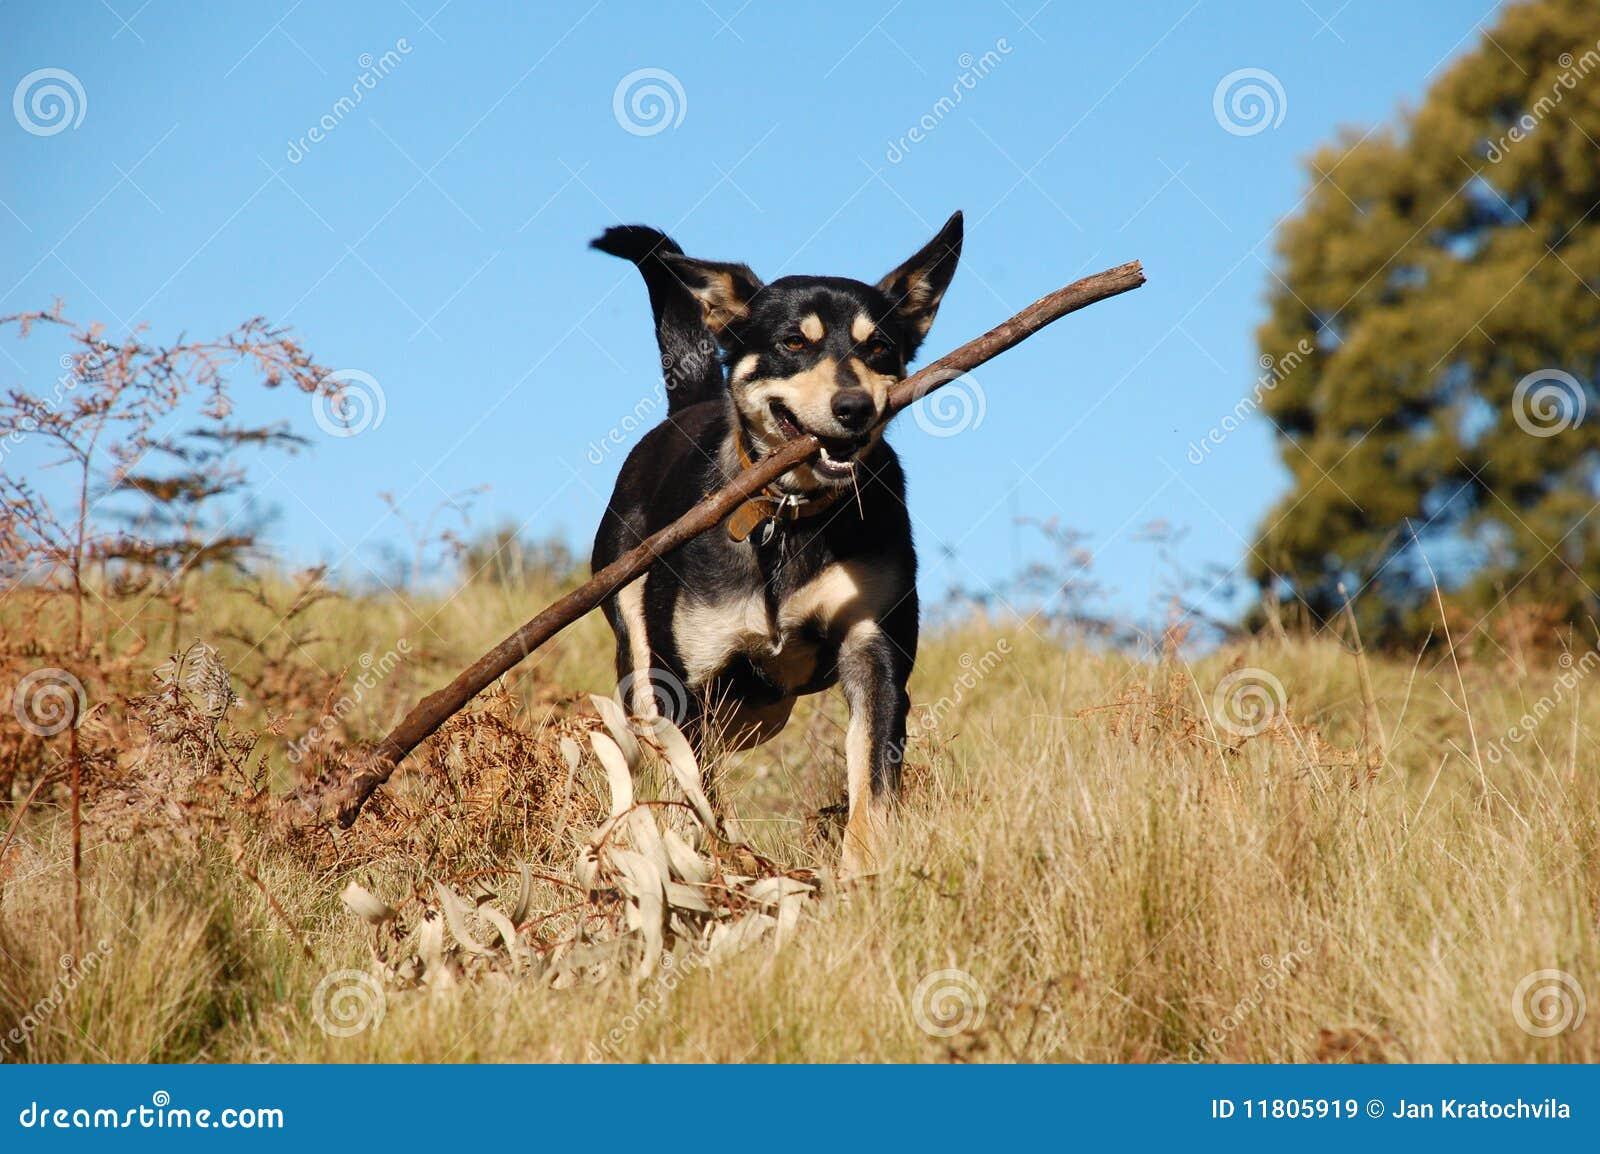 Dog Retrieving A Stick In Australian Bush Royalty Free